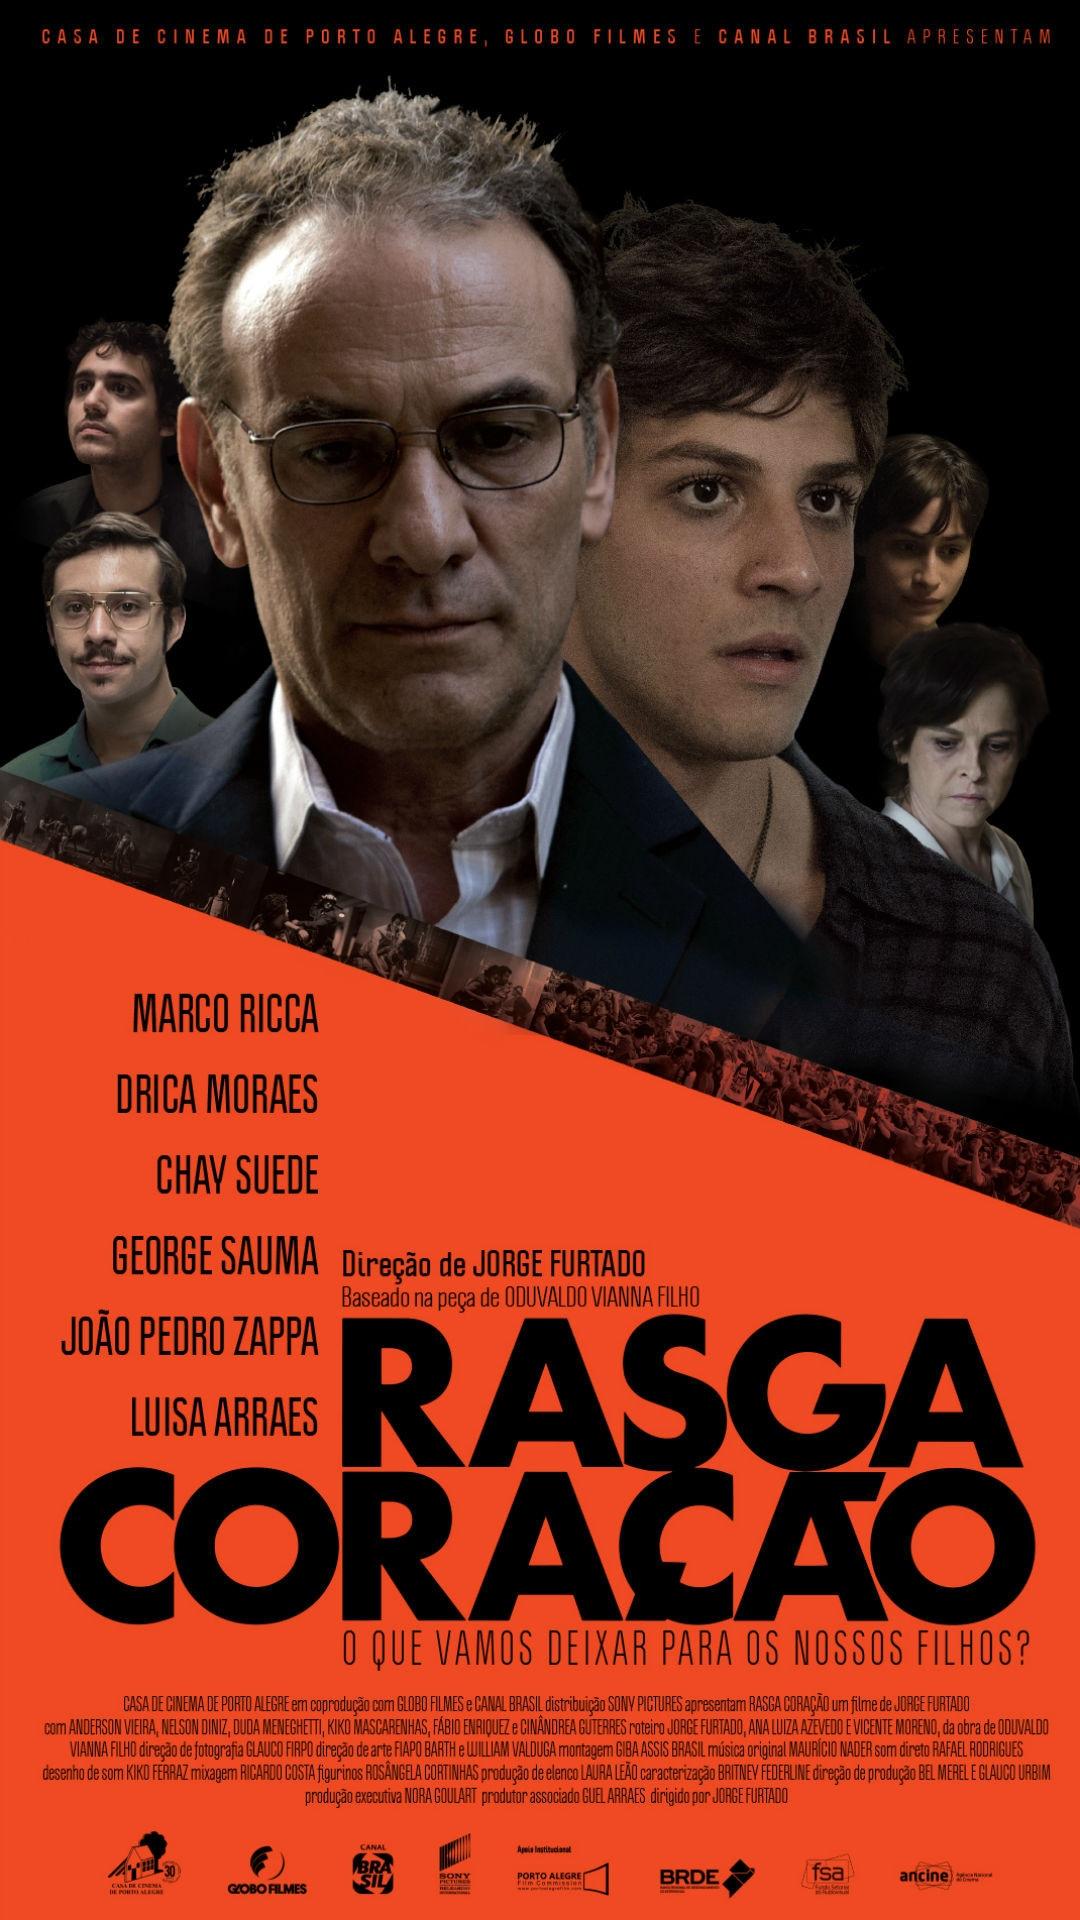 Chay Suede, Marco Ricca, Drica Moraes